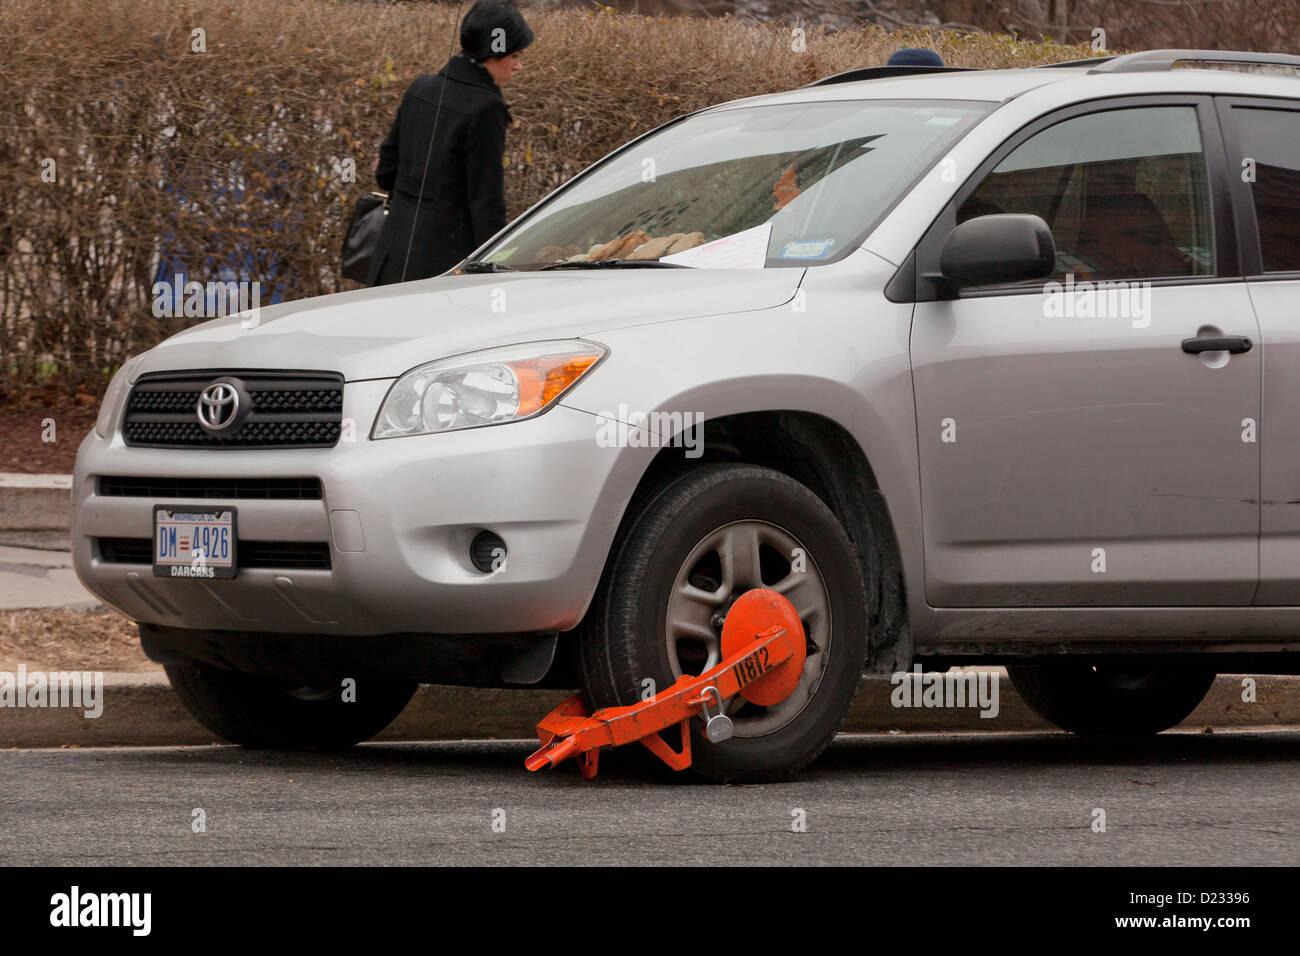 Wheel lock on car - USA - Stock Image